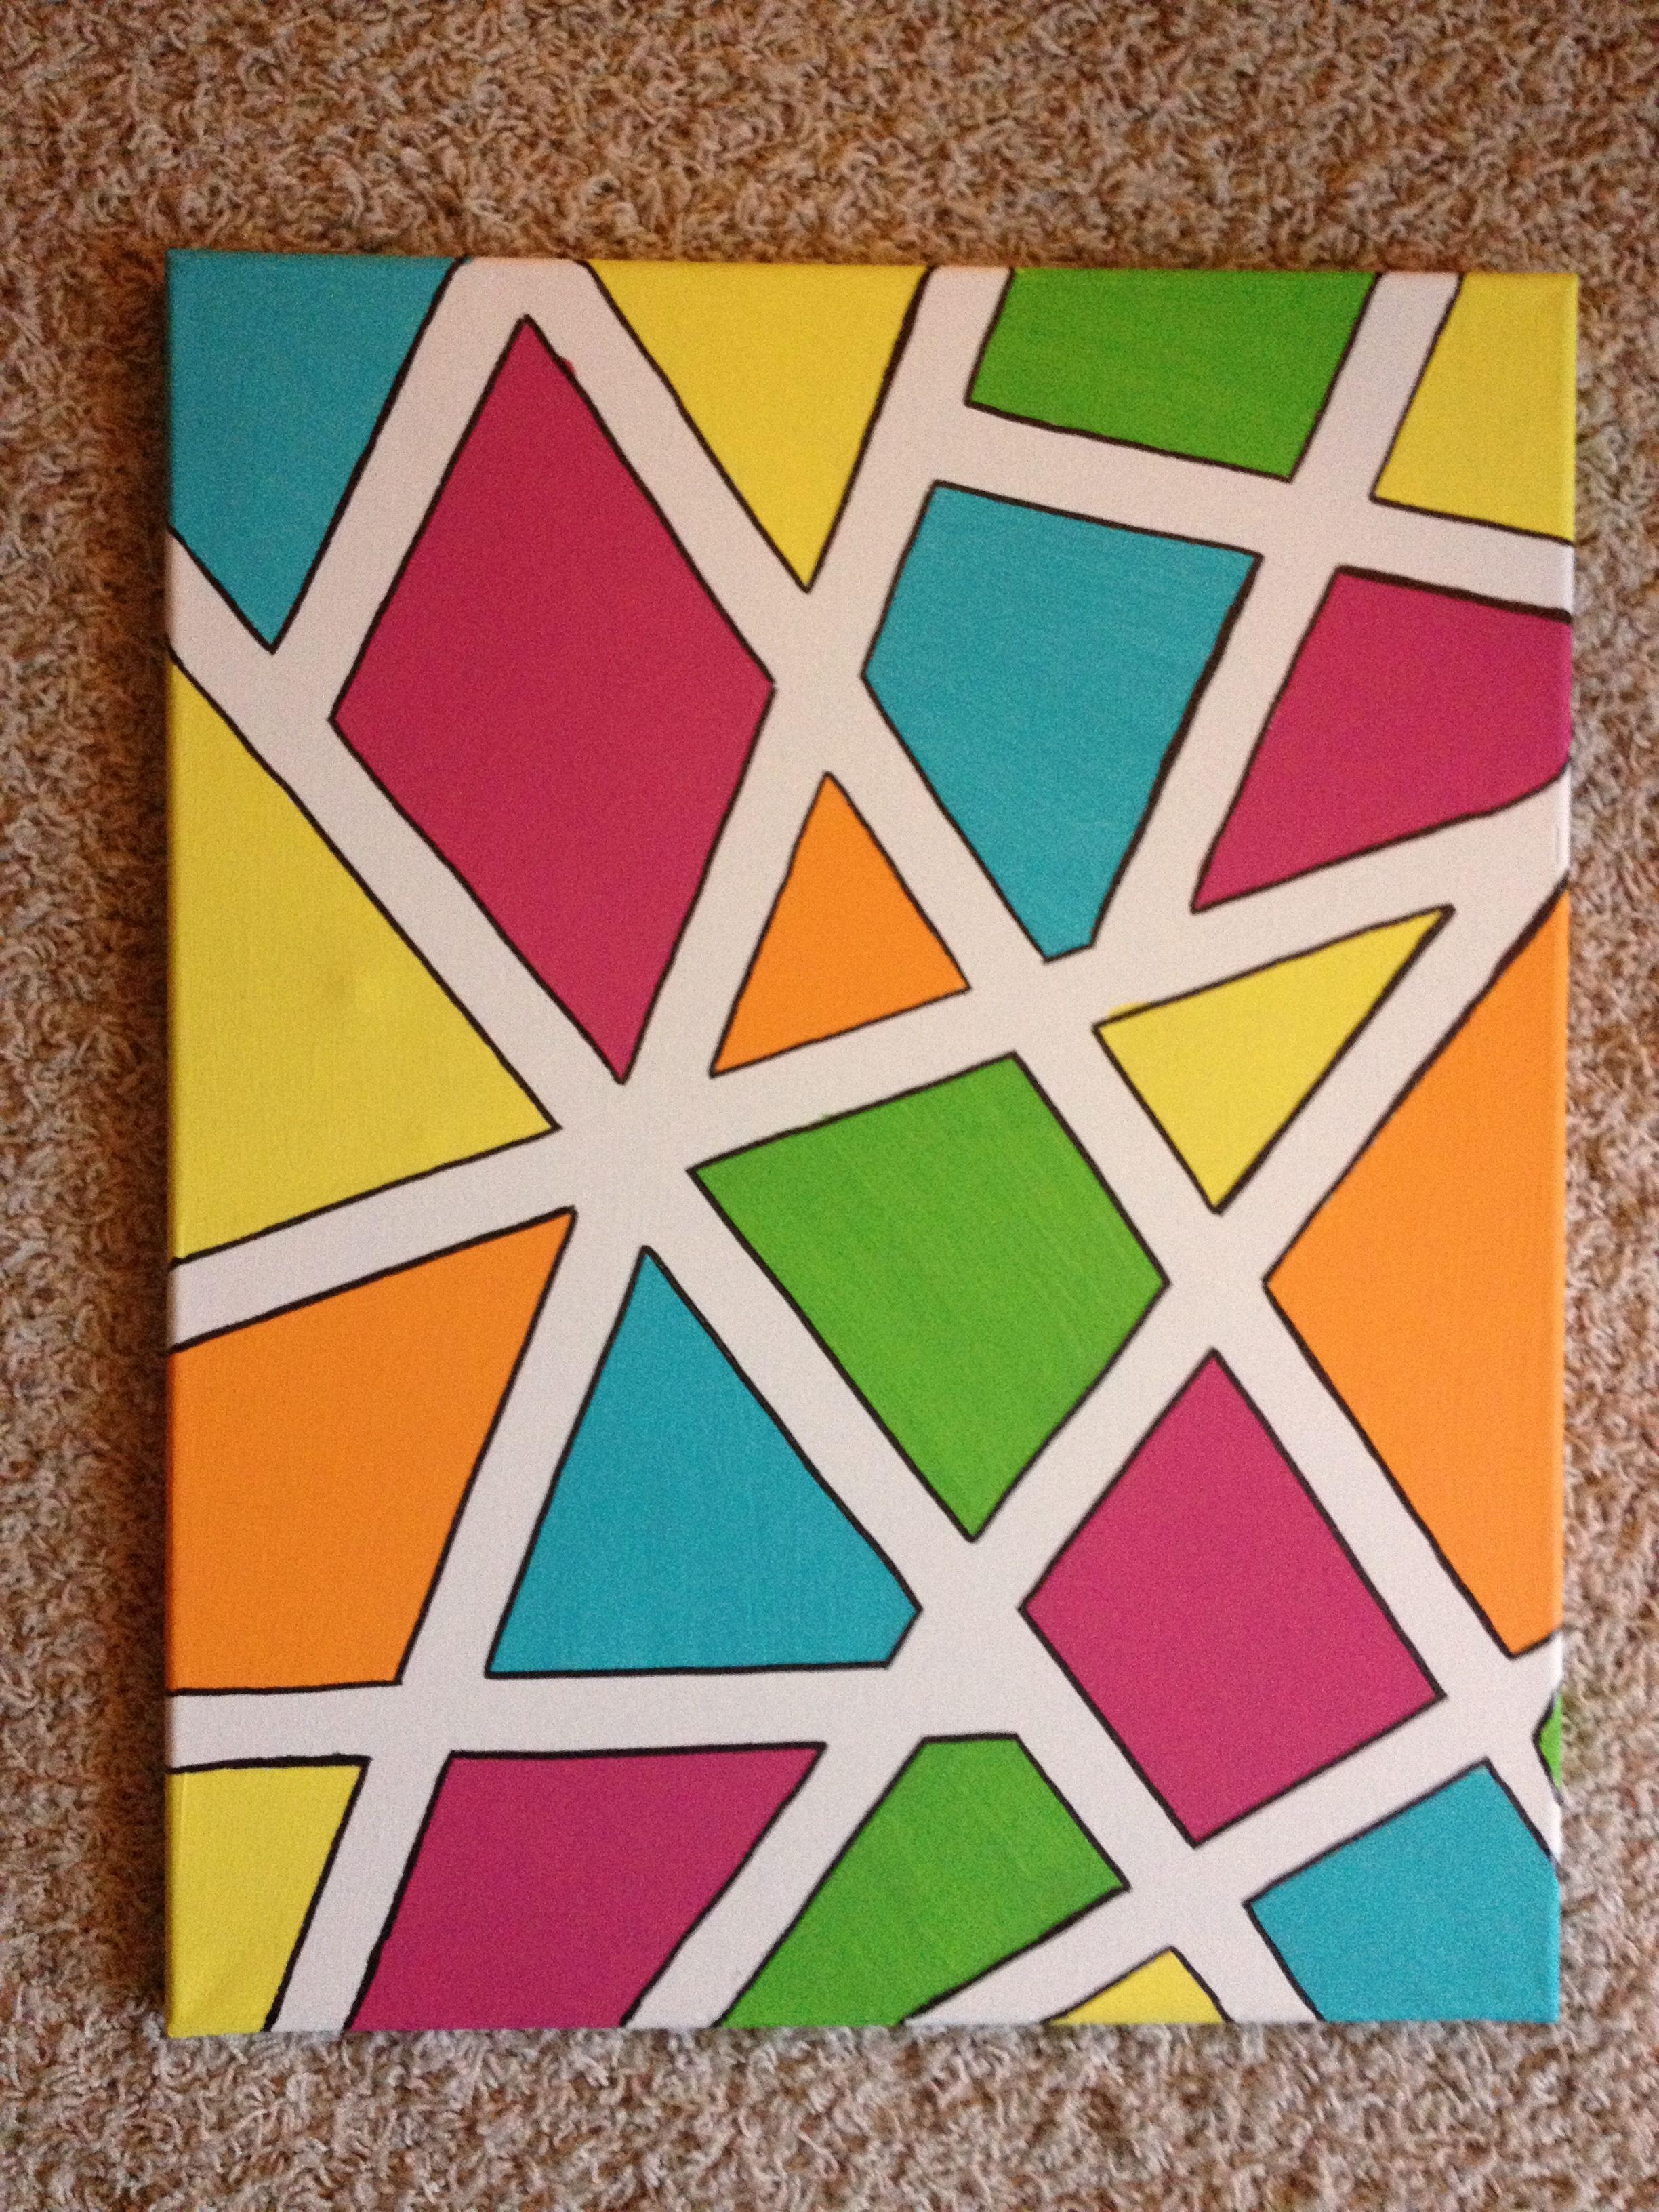 Related Image Painters Tape Art Tape Art Masking Tape Art